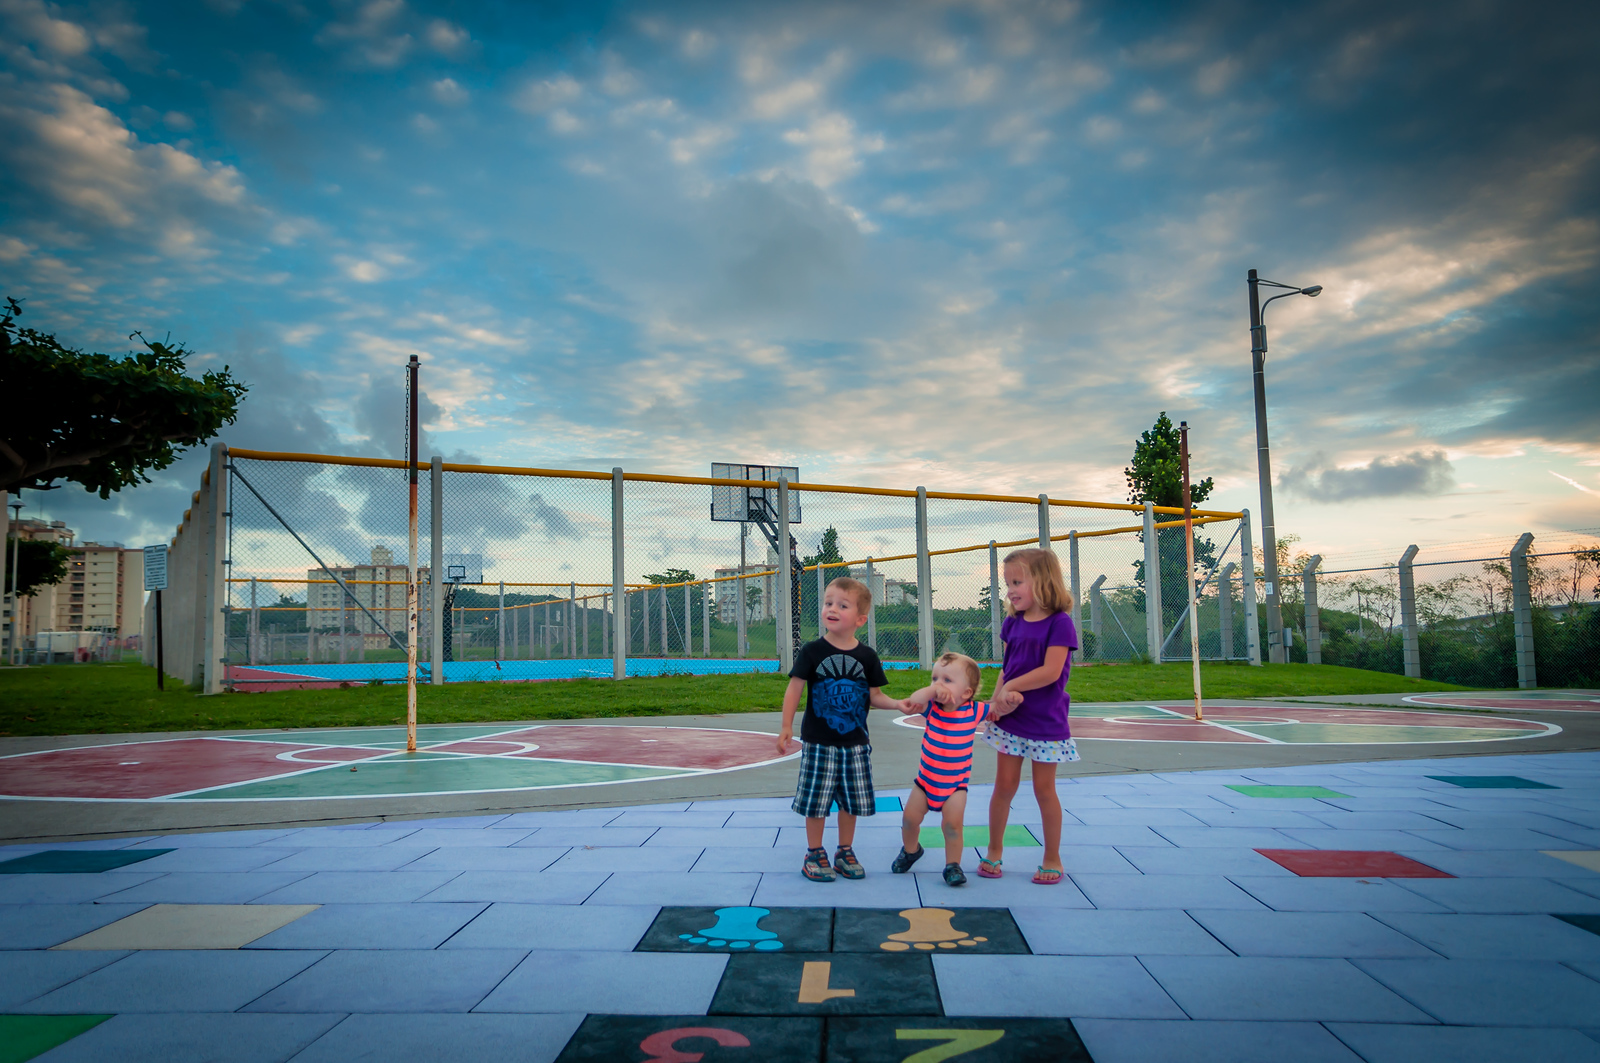 On the Playground - September 3